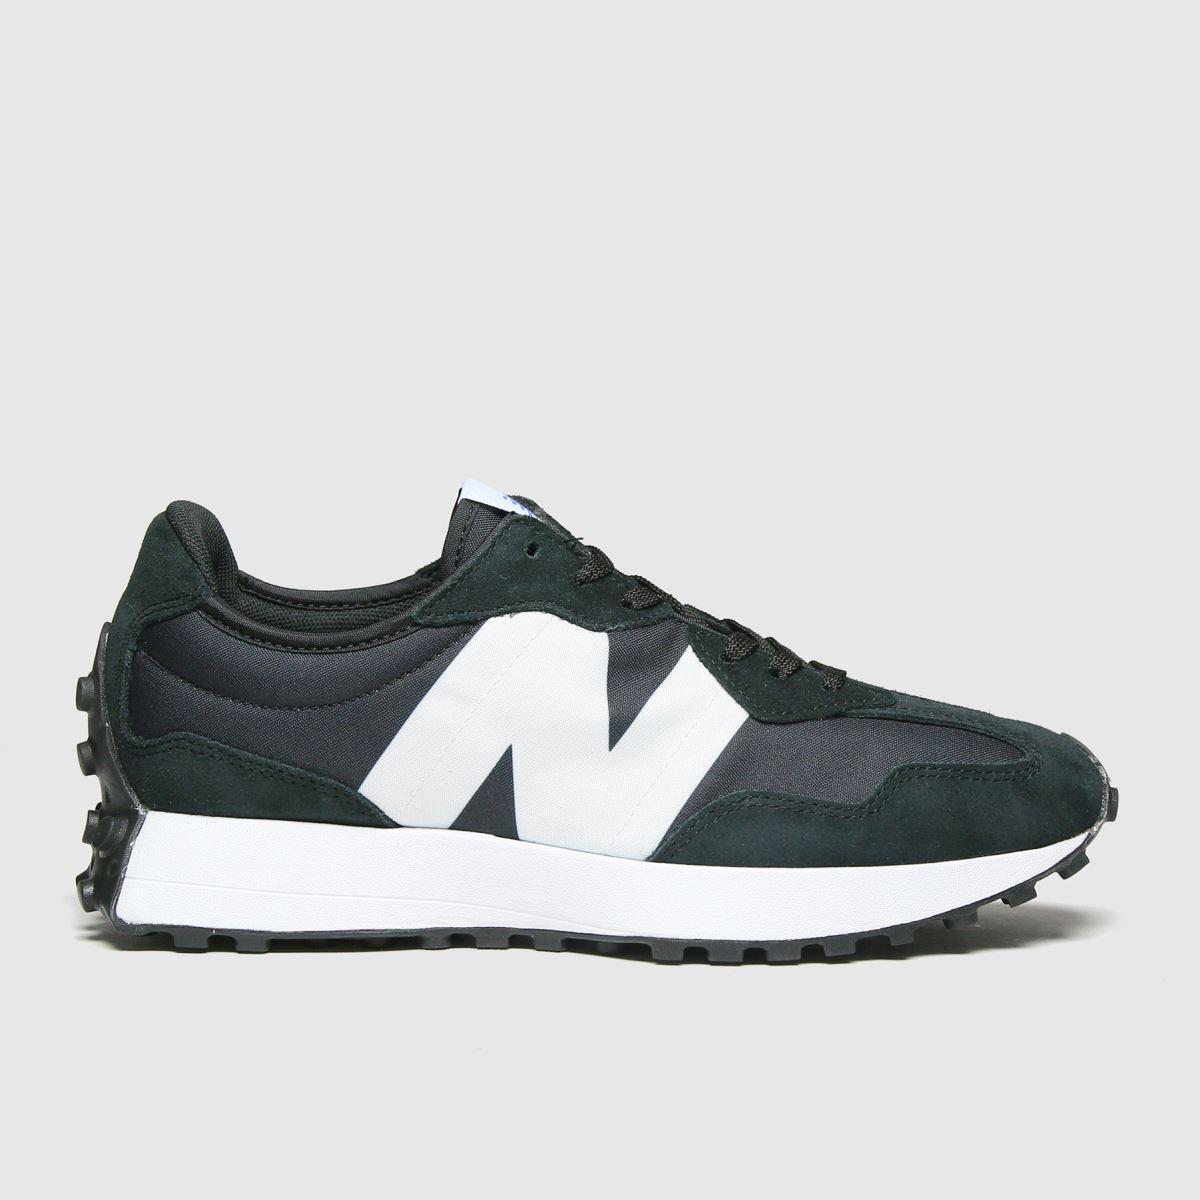 New Balance Black & White 327 Trainers